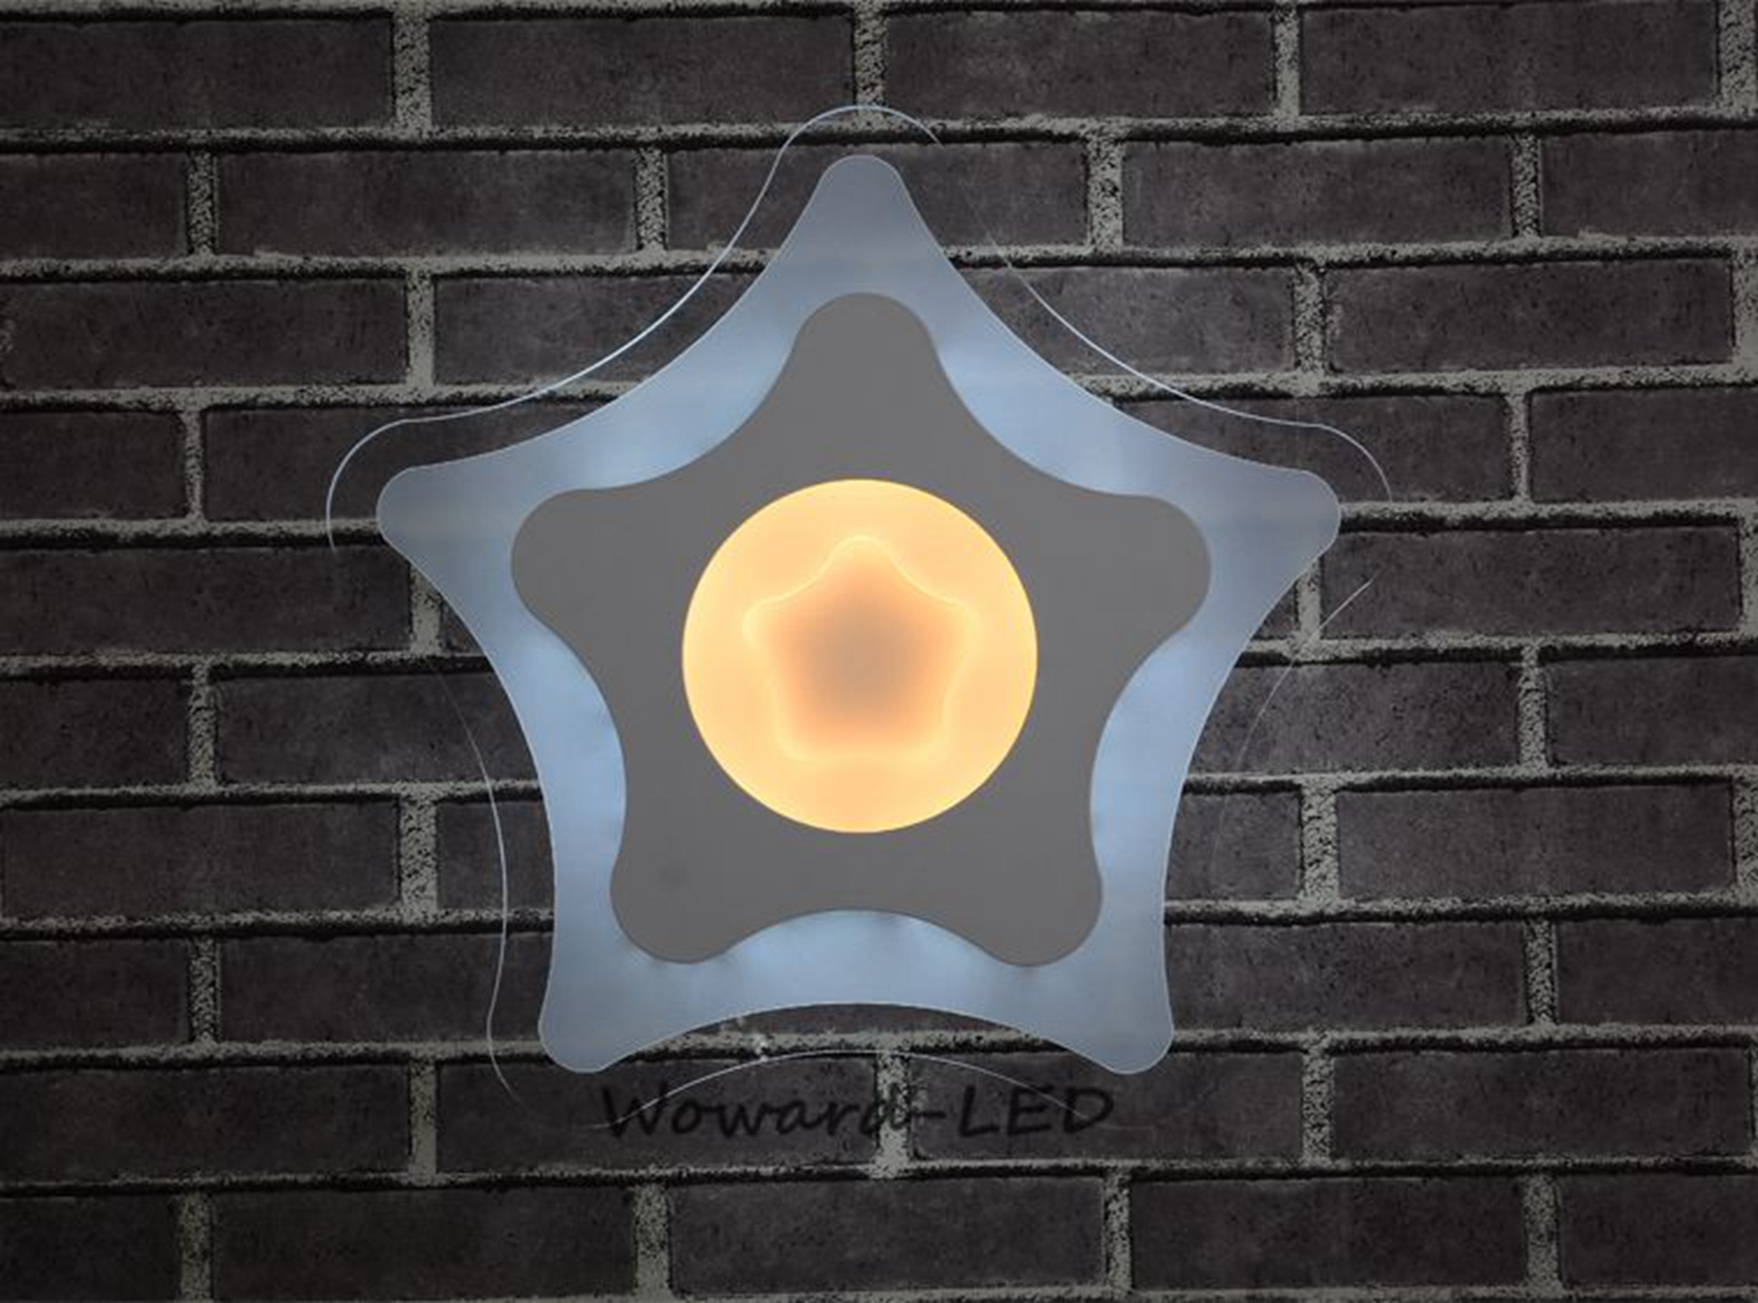 wow stern led deckenlampe deckenleuchte 16w bis 72w dimmbar lampe beleuchtung ebay. Black Bedroom Furniture Sets. Home Design Ideas